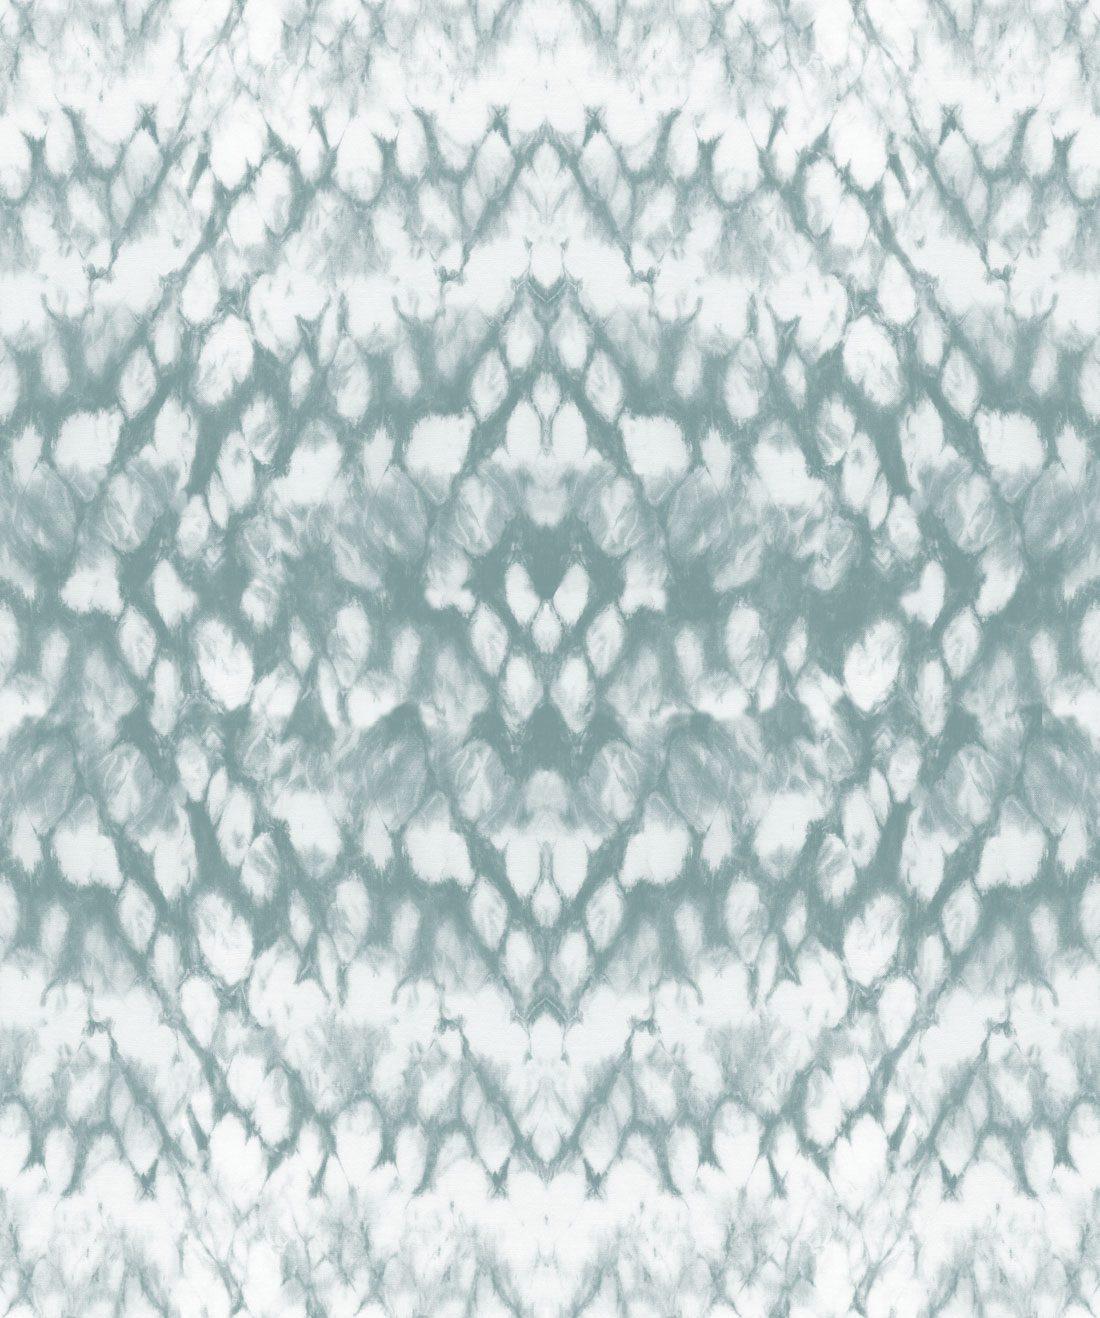 Entomology Dew Wallpaper